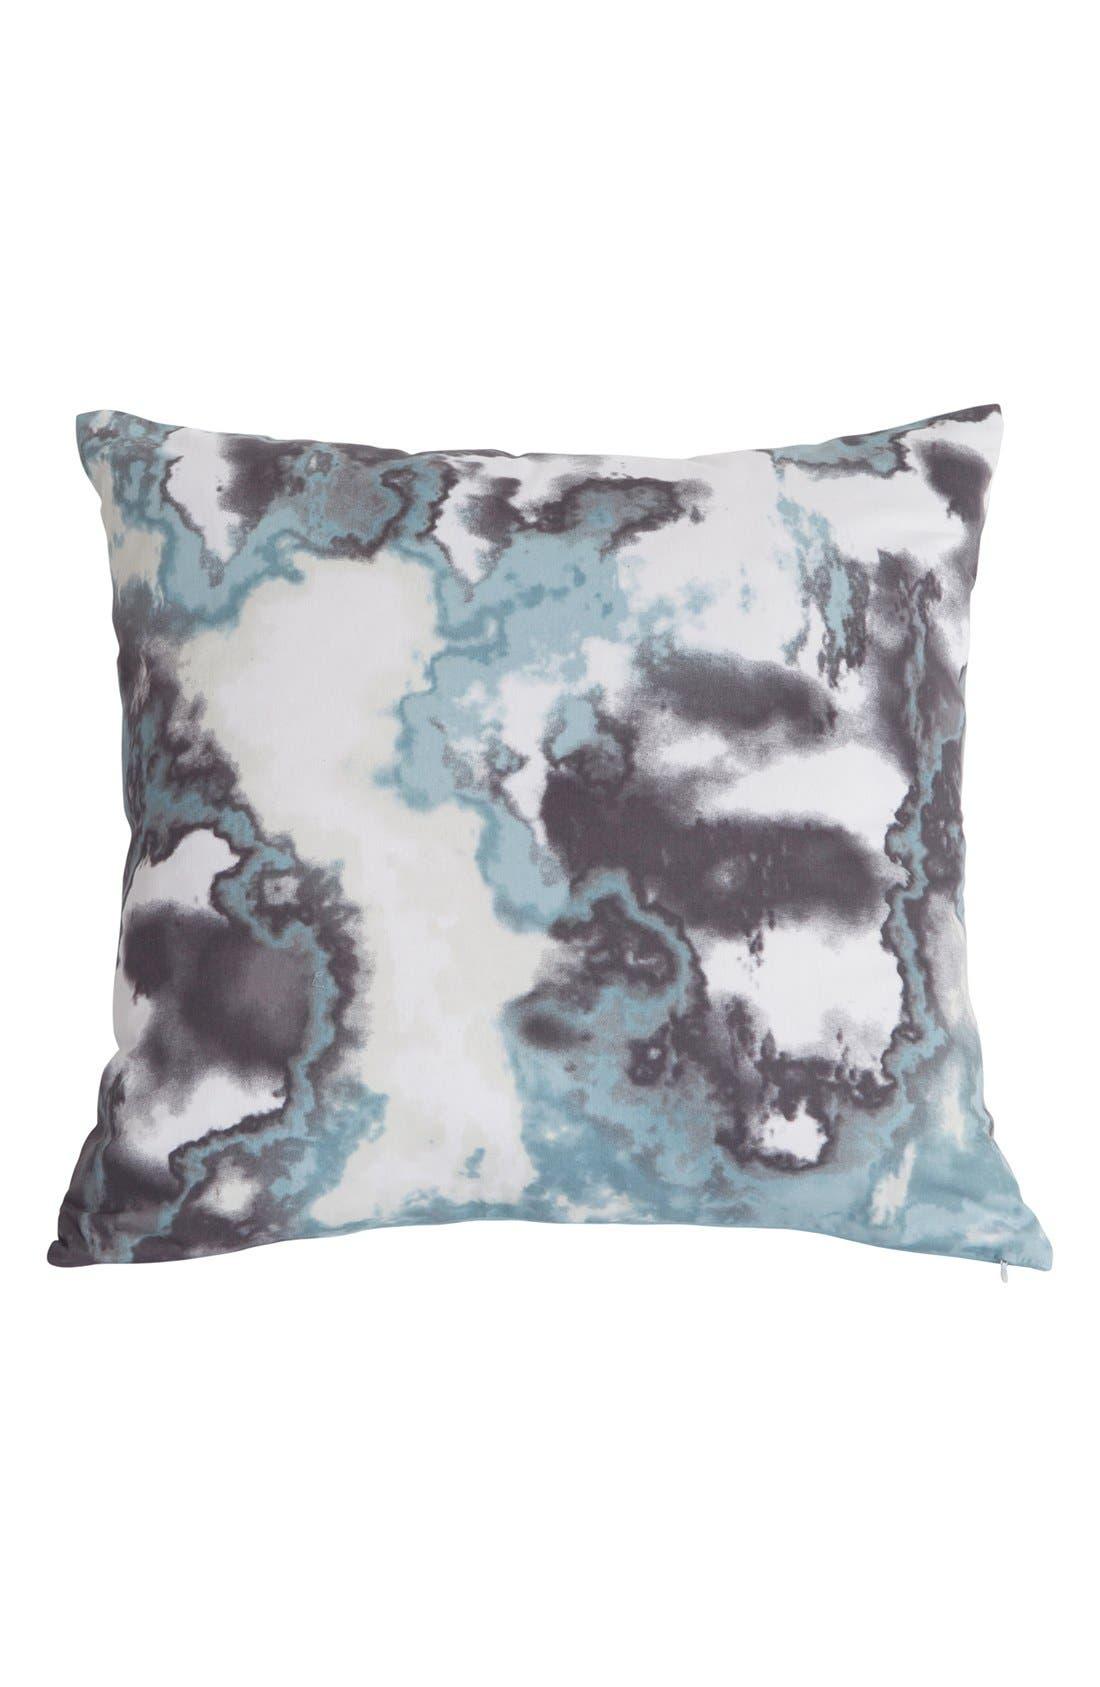 'Kittery' Pillow,                             Main thumbnail 1, color,                             STEEL/ GREY